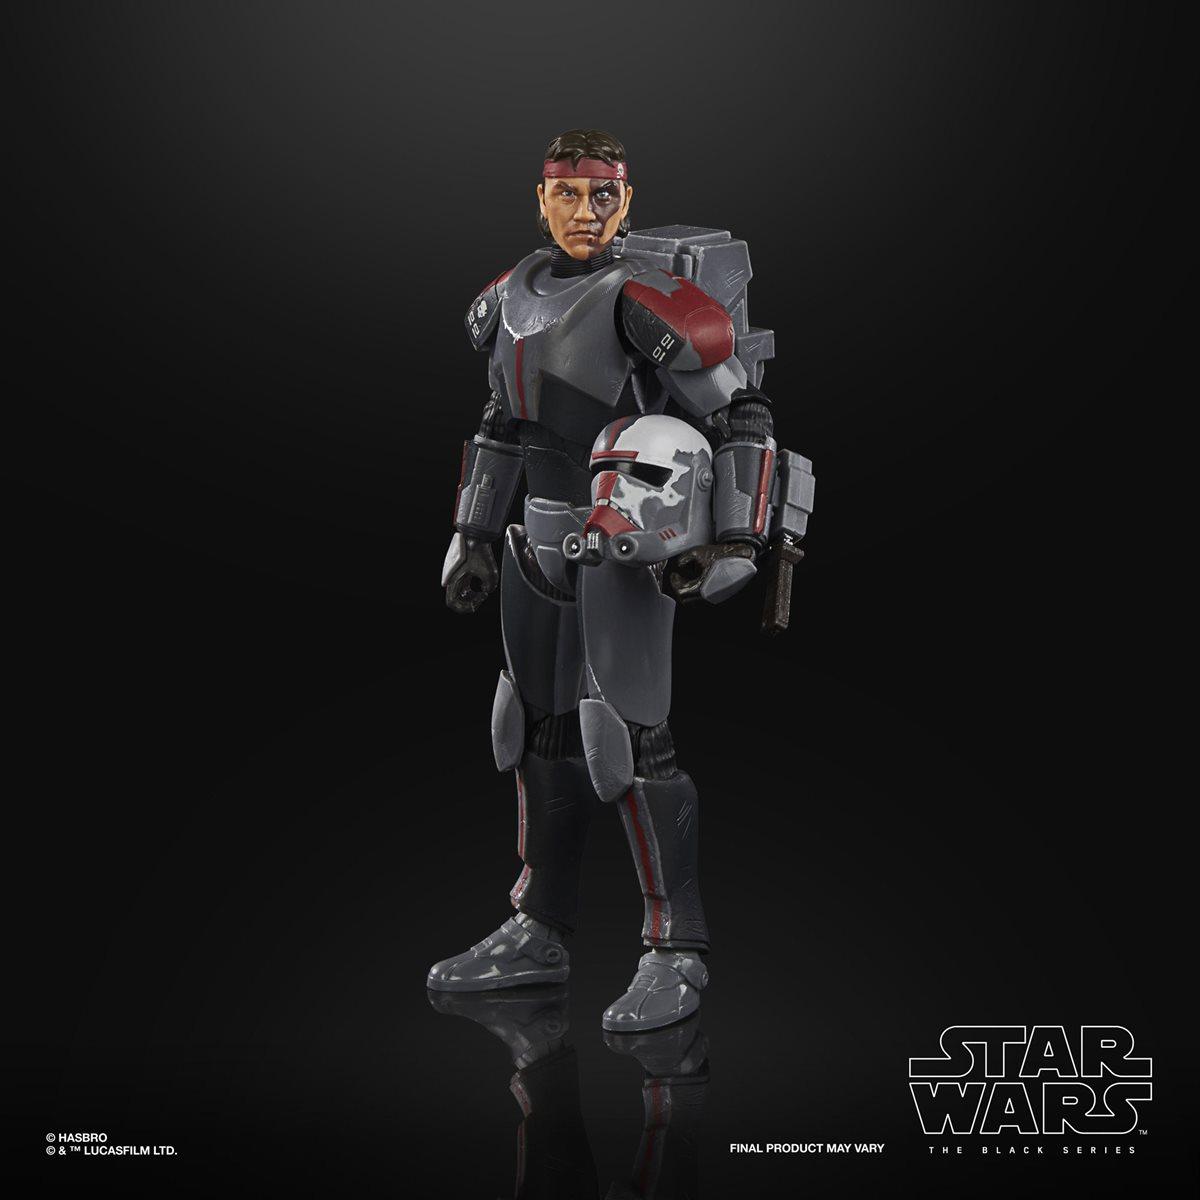 *** PRE-ORDER *** Star Wars the Black Series 6-Inch Bad Batch Clone Crosshair